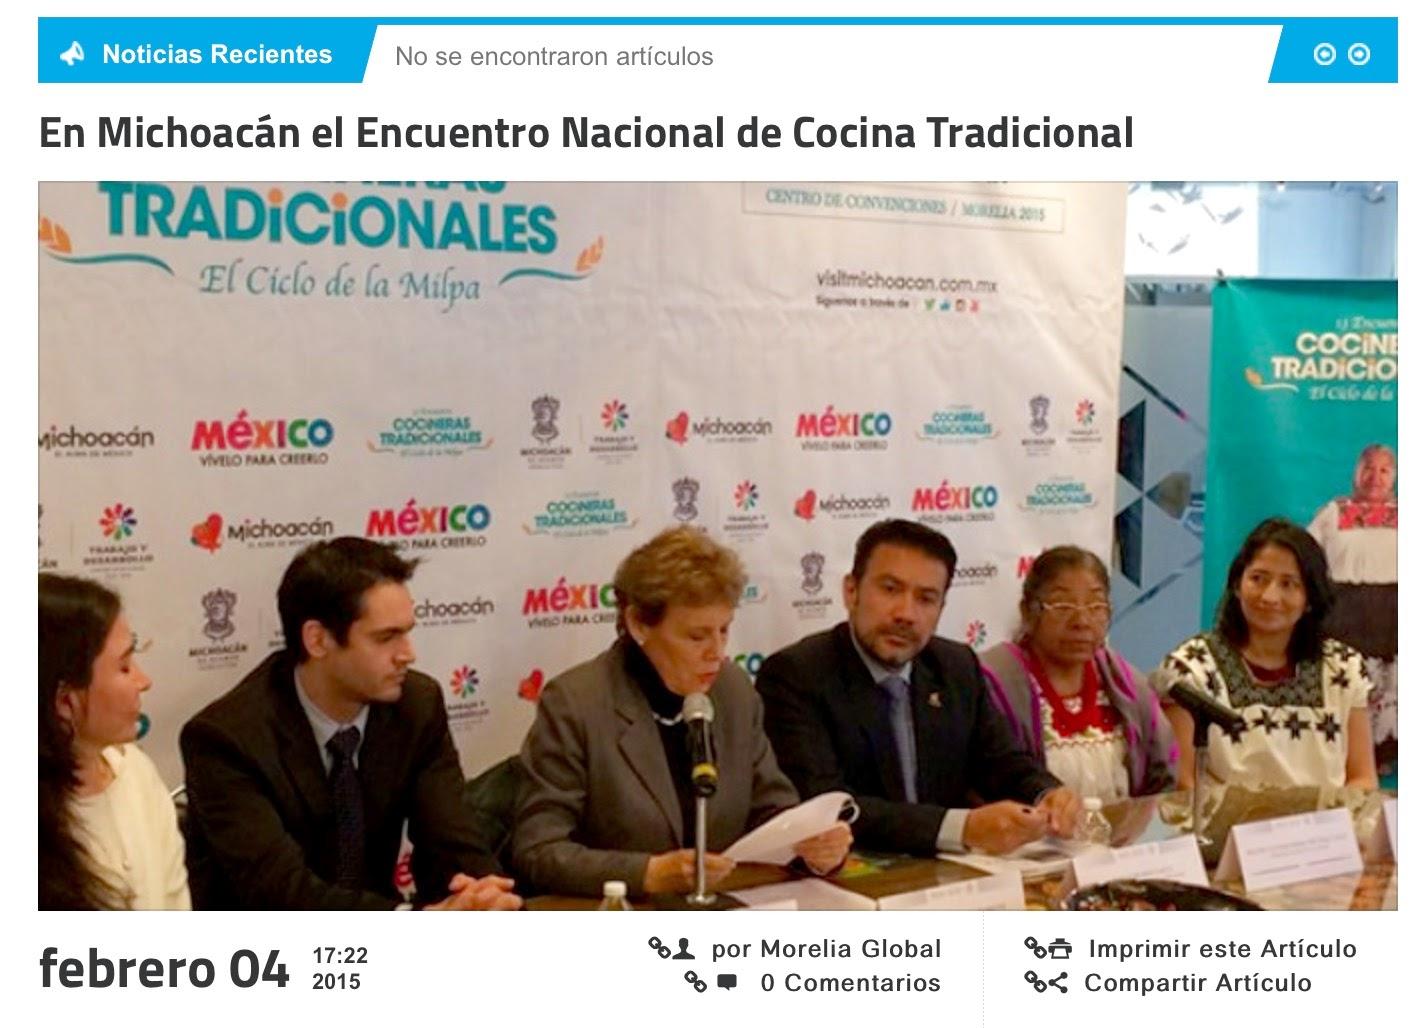 http://moreliaglobal.com/en-michoacan-el-encuentro-nacional-de-cocina-tradicional/